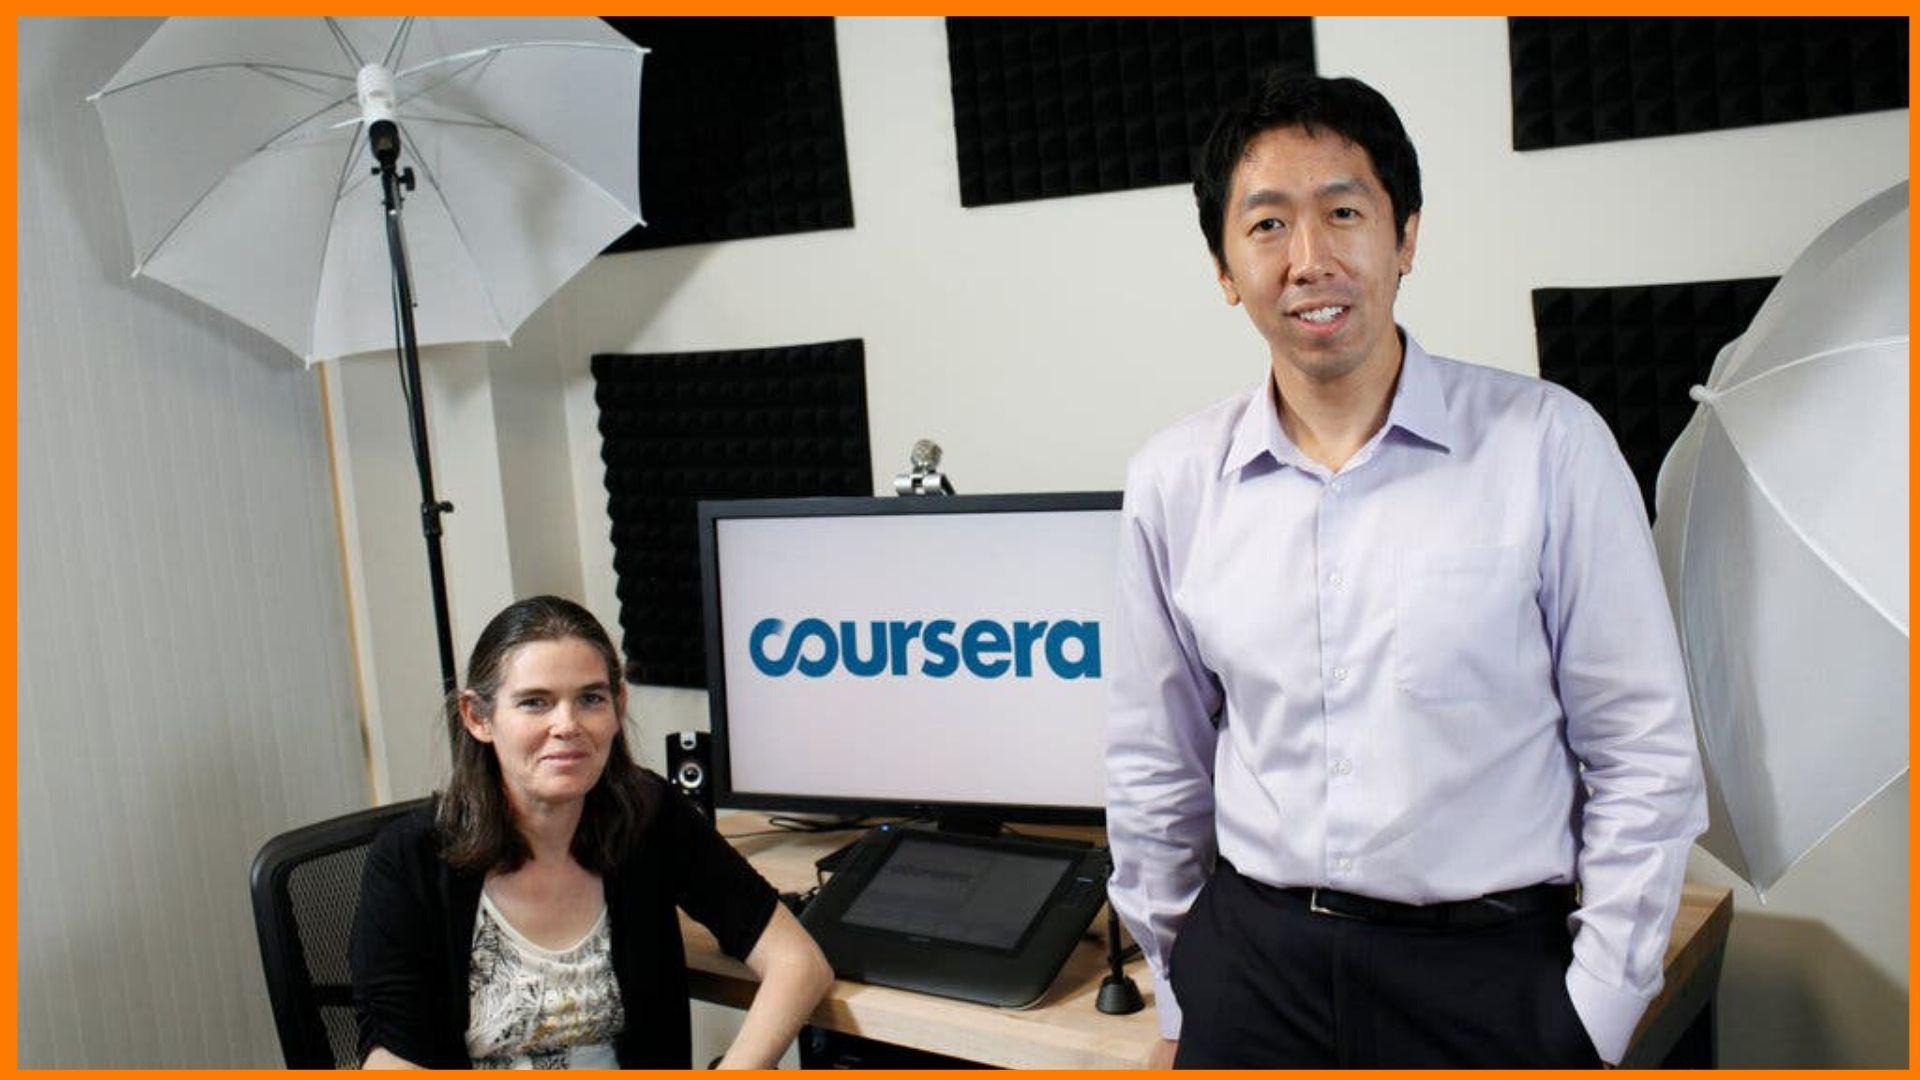 Coursera - World's Largest Online Education Portal!